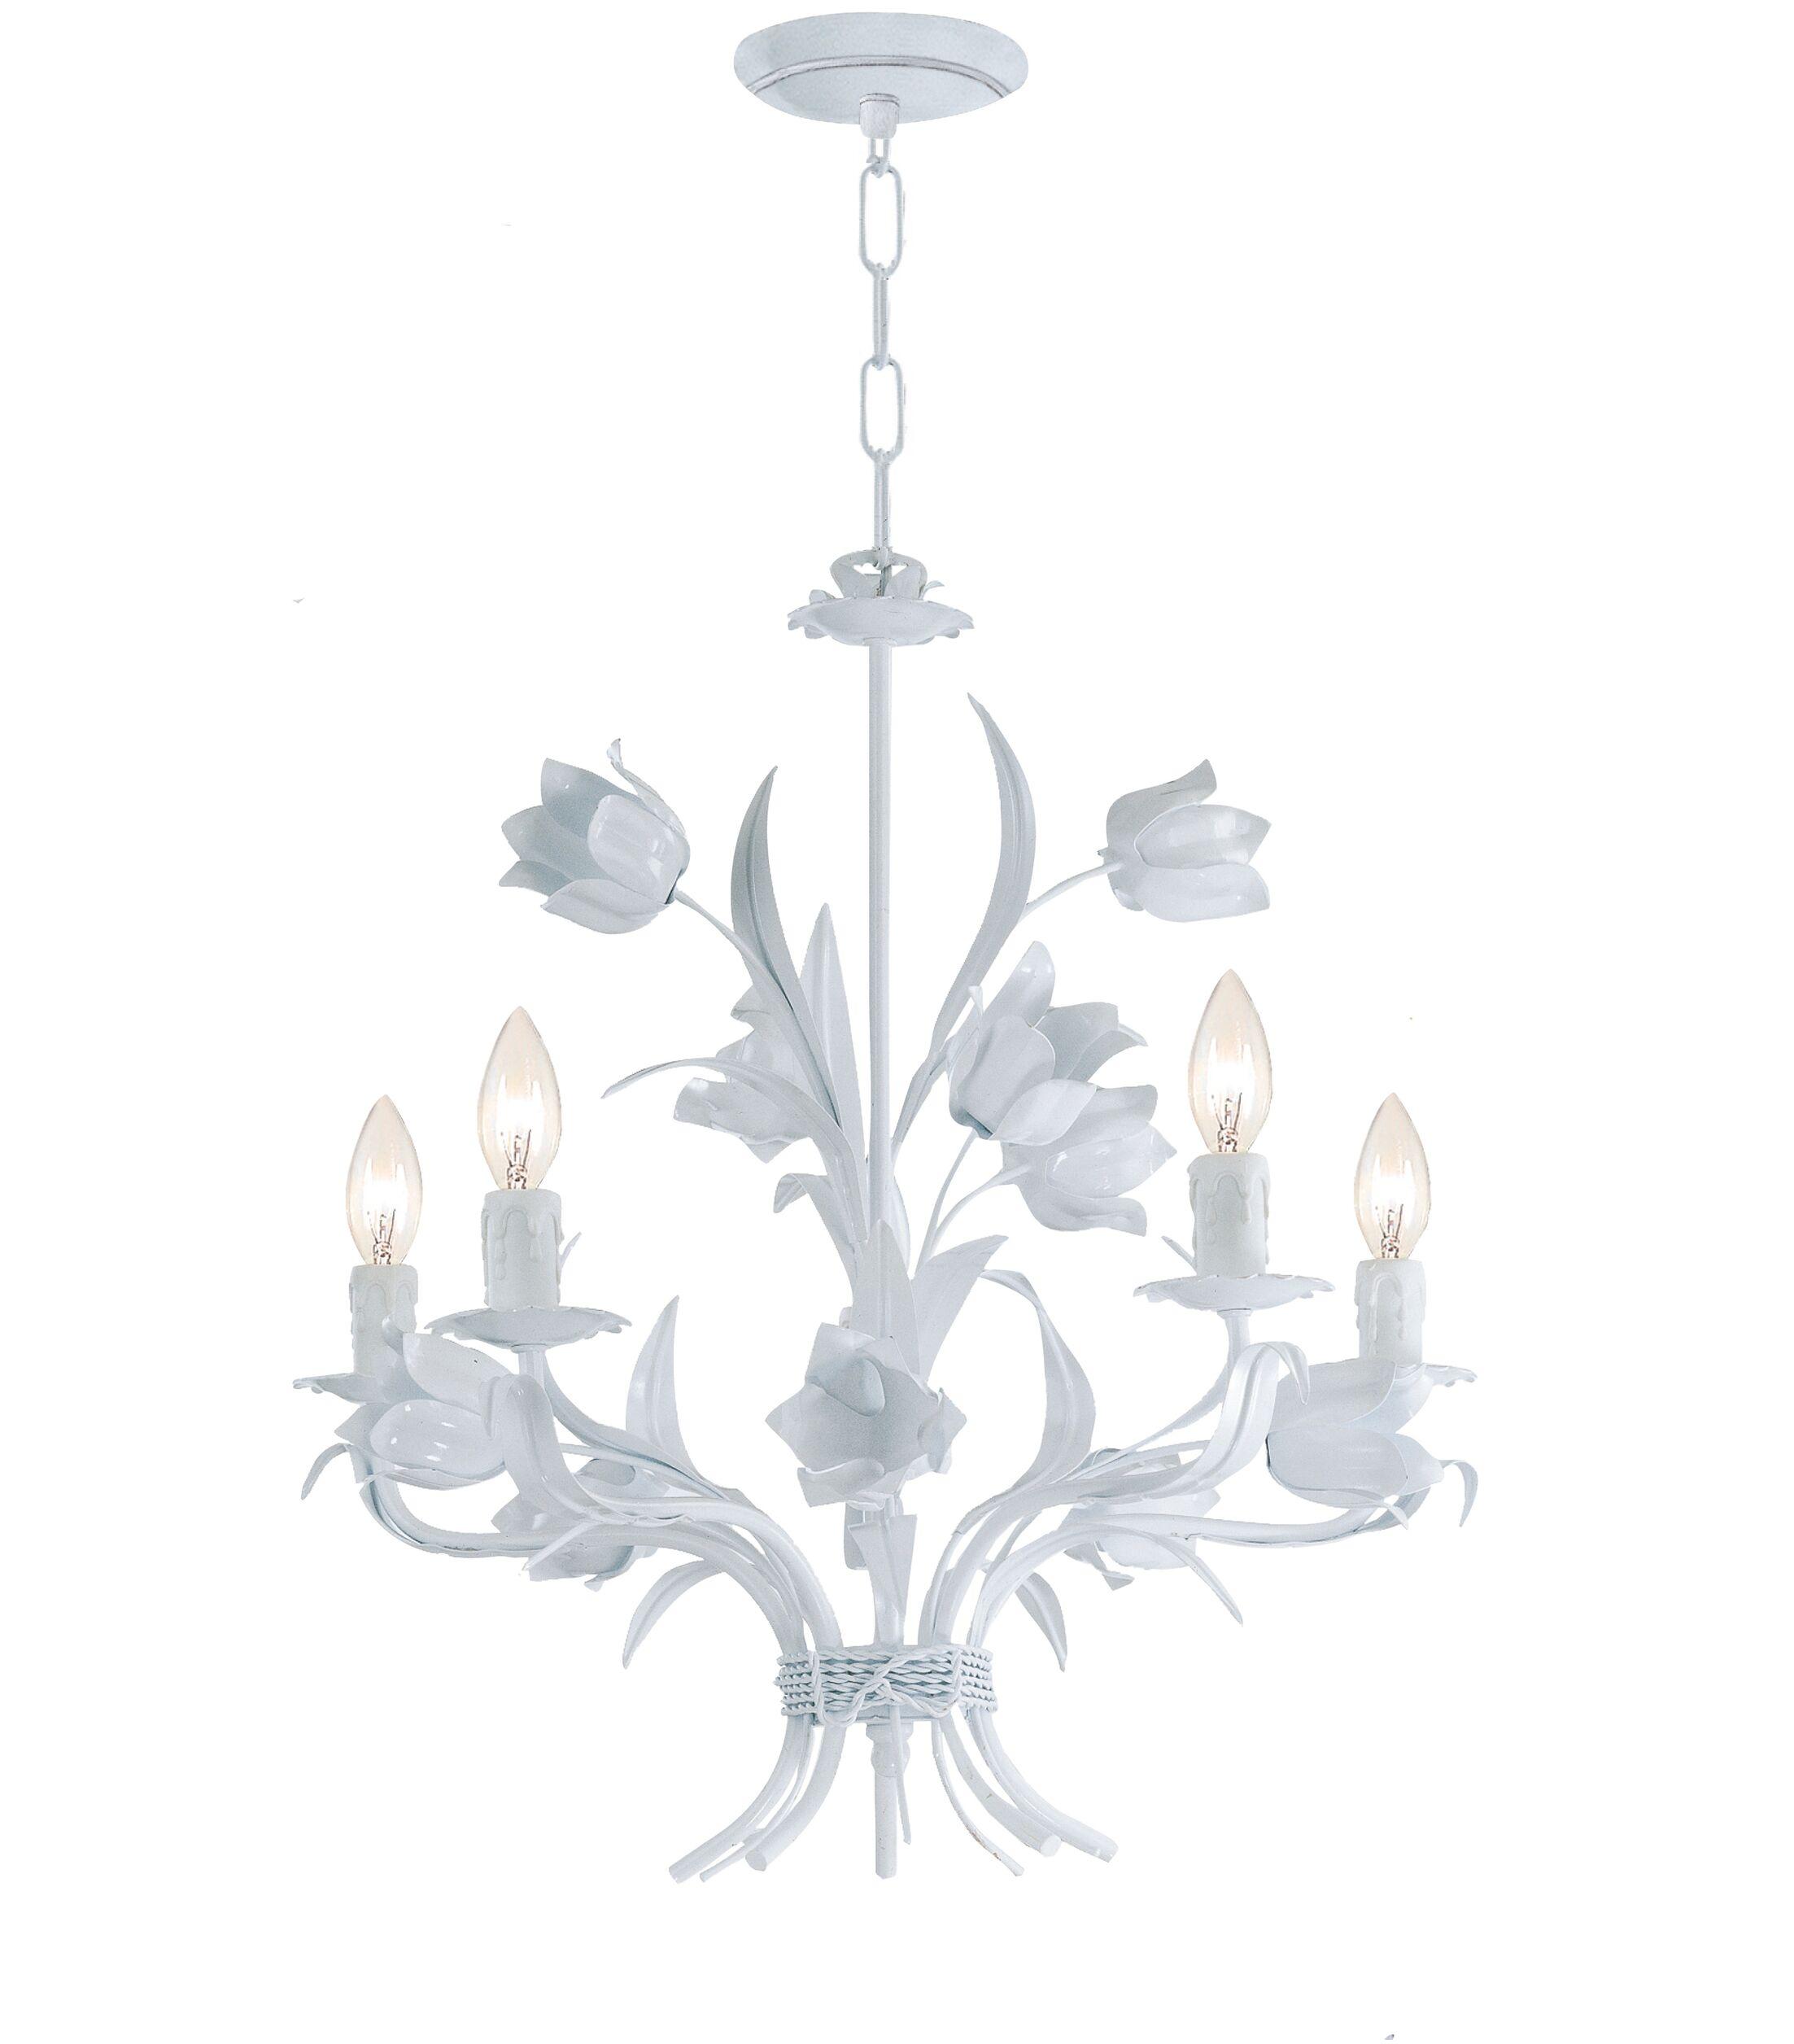 Destinie 4-Light Candle Style Chandelier